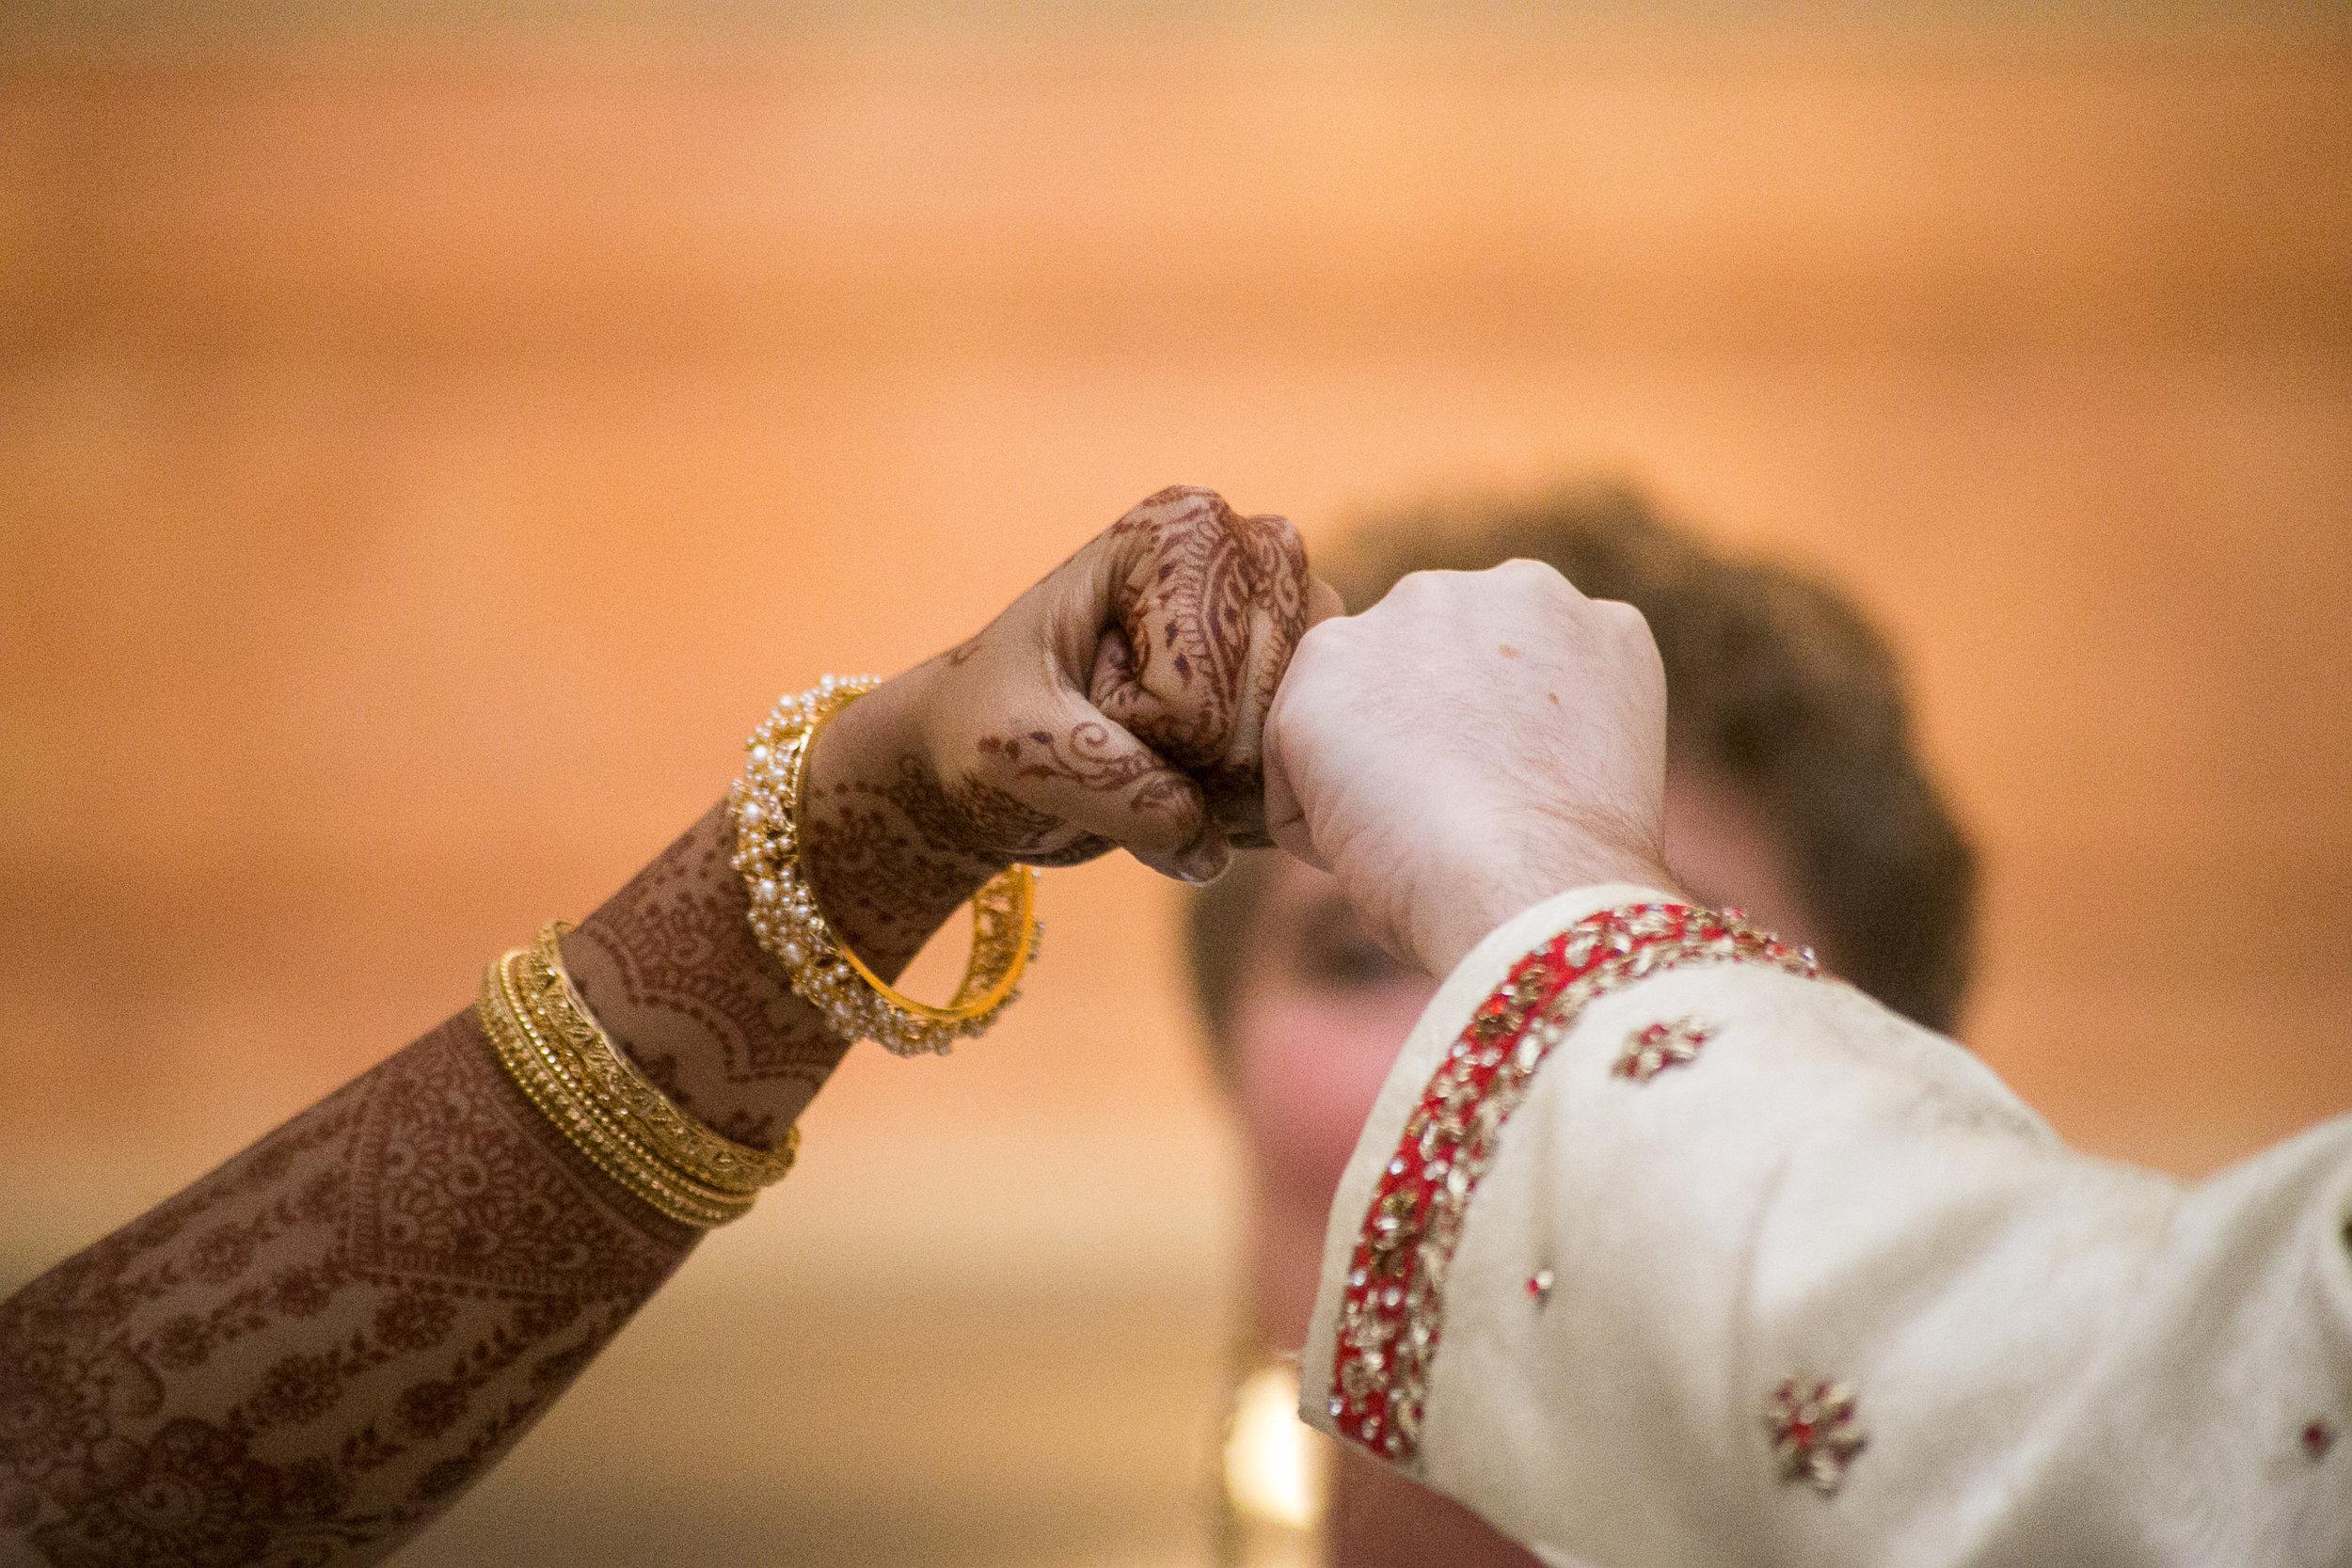 fist bump wedding